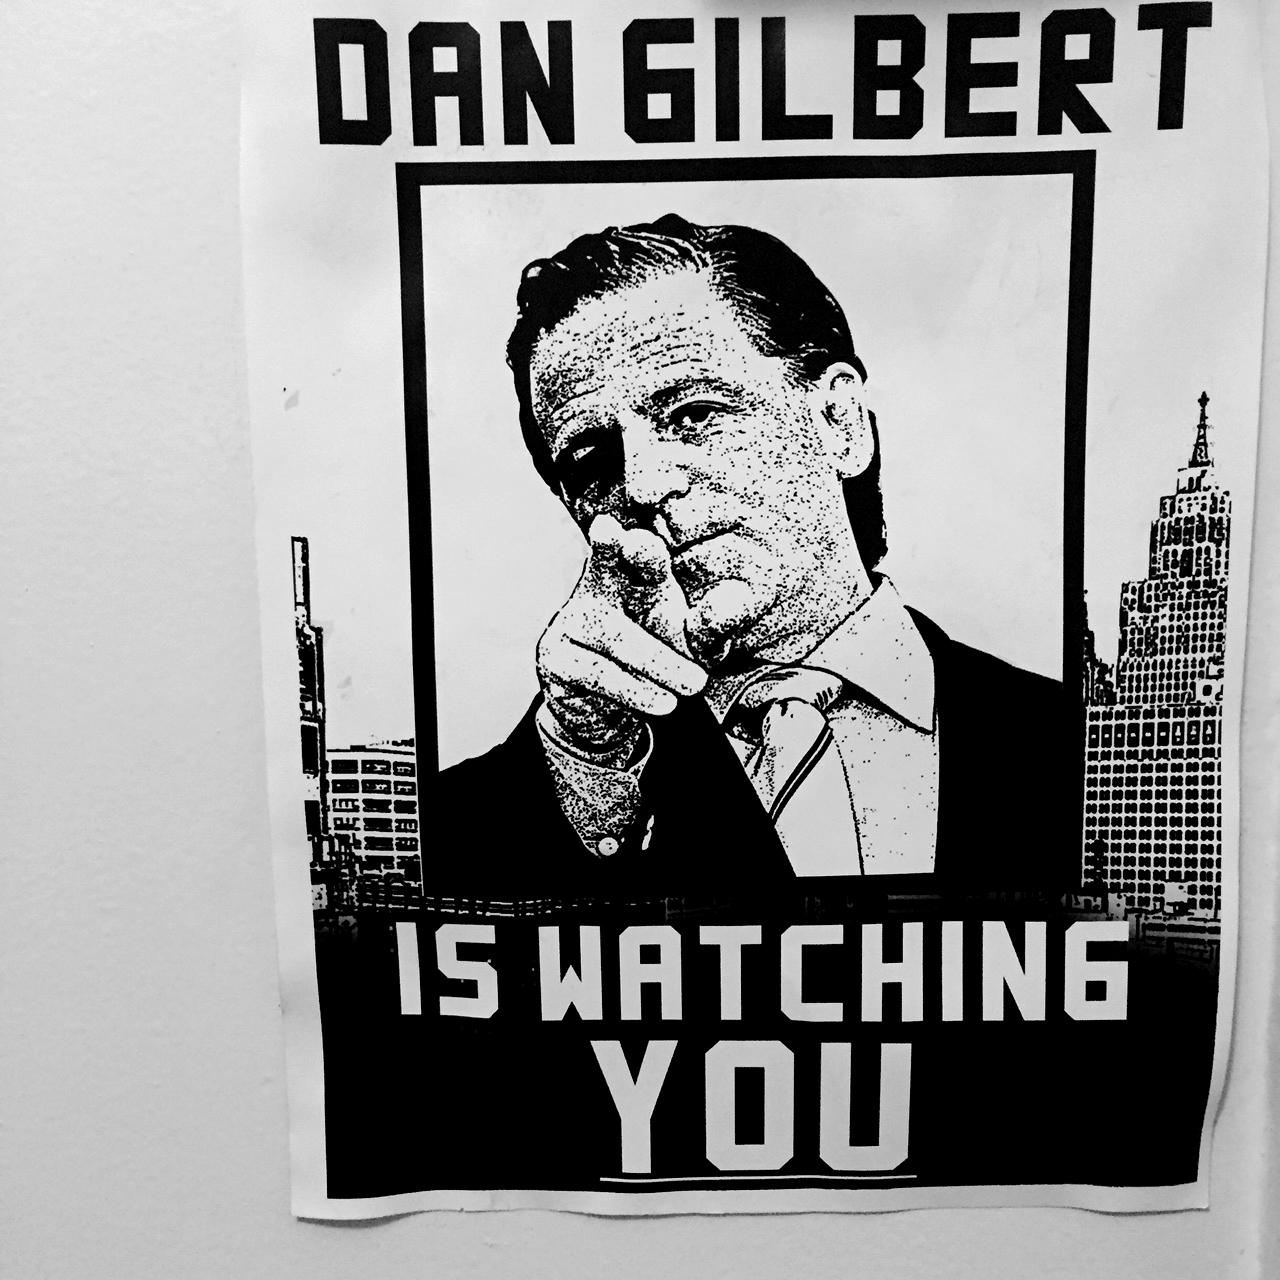 DanGilbert.jpg